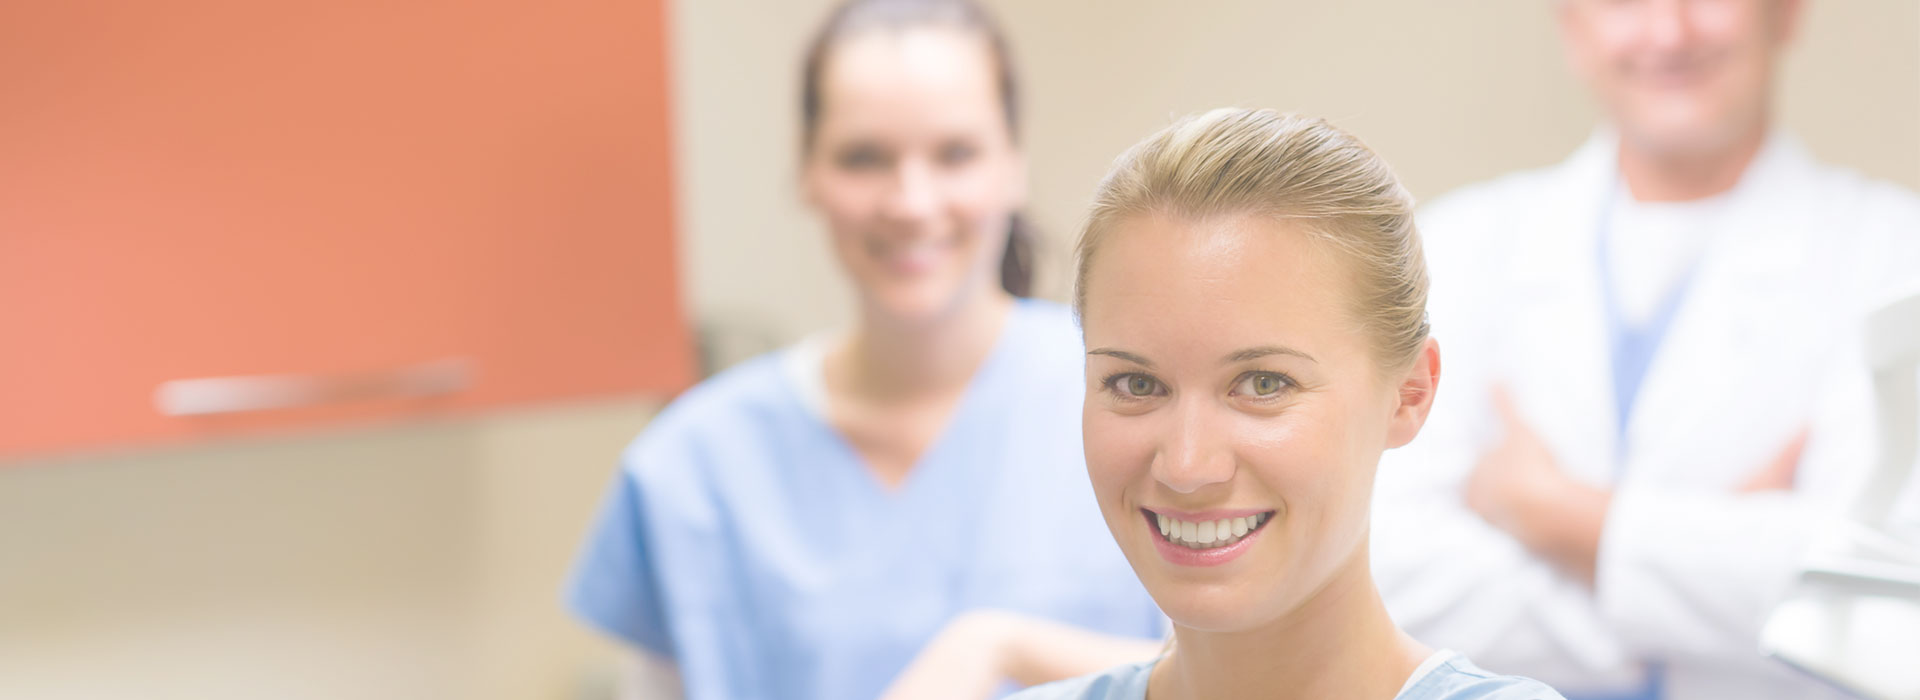 Dentists smiling at dental